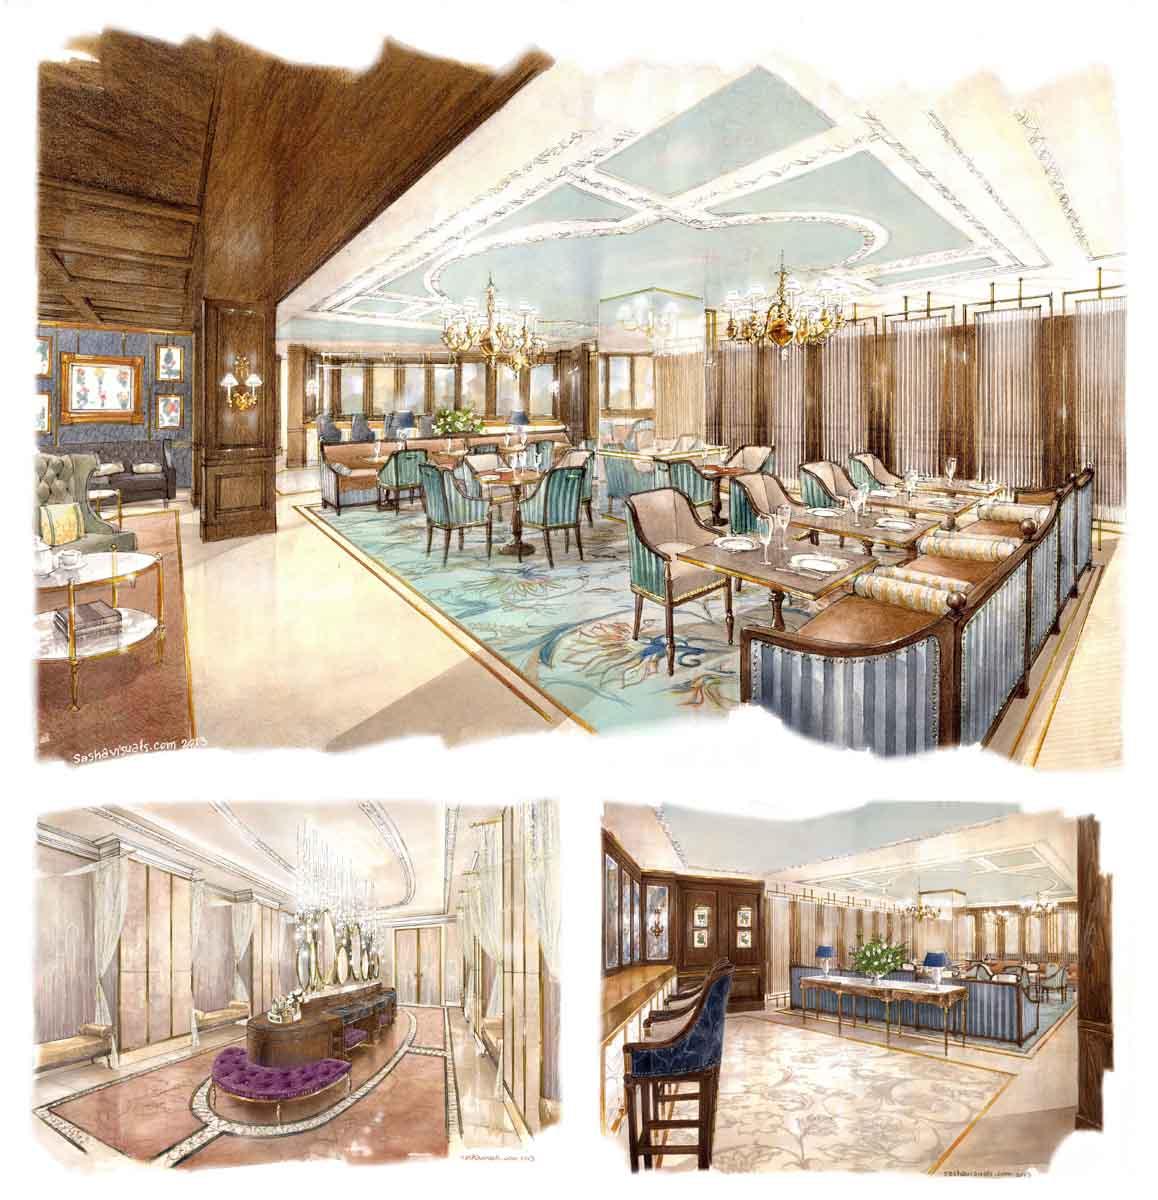 Lanesborough_Spa_1508_London_interior_design_sketches